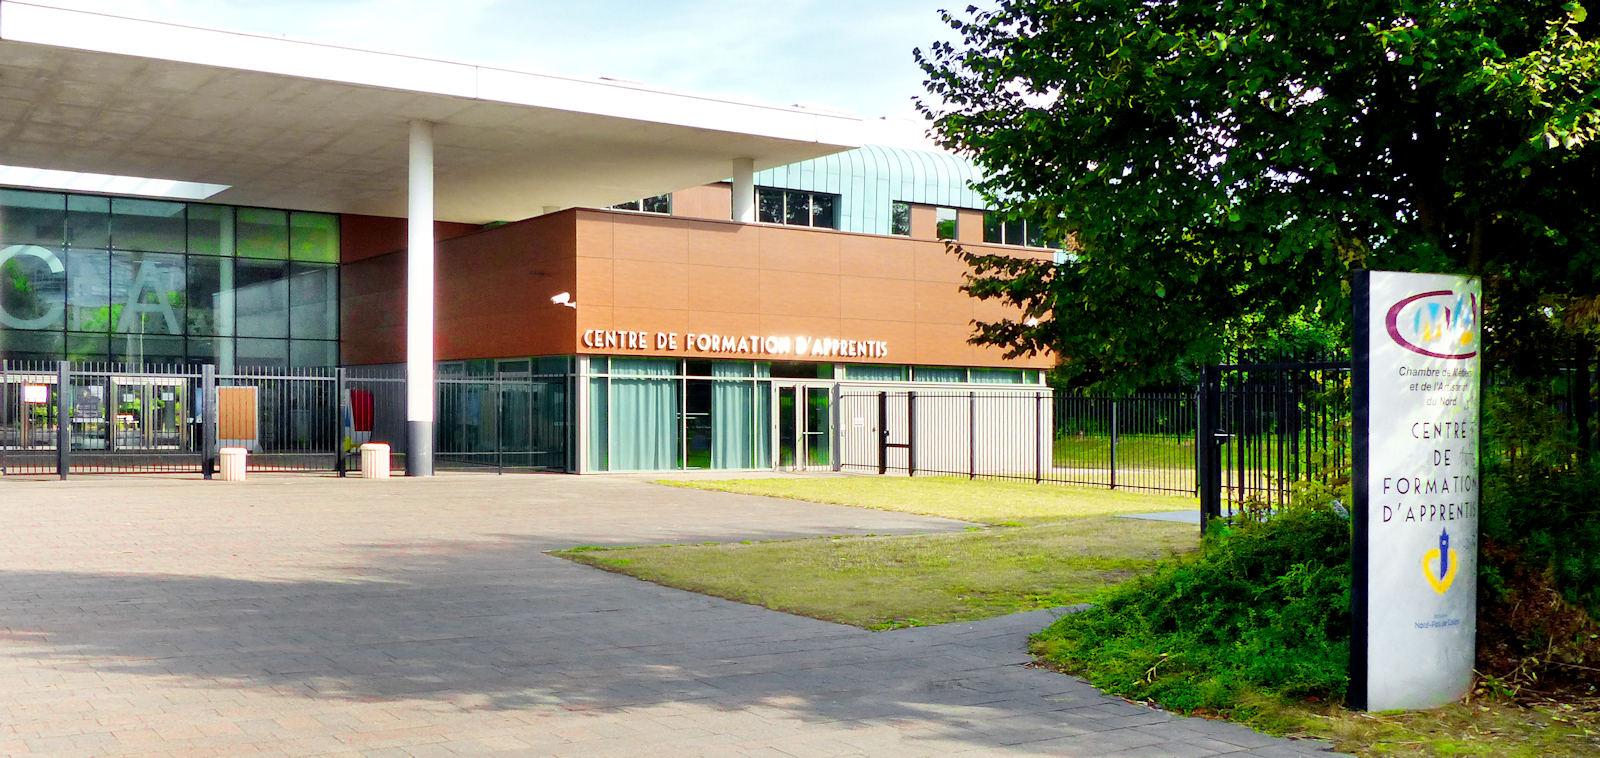 CMA CFA Hauts-de-France, Tourcoing.